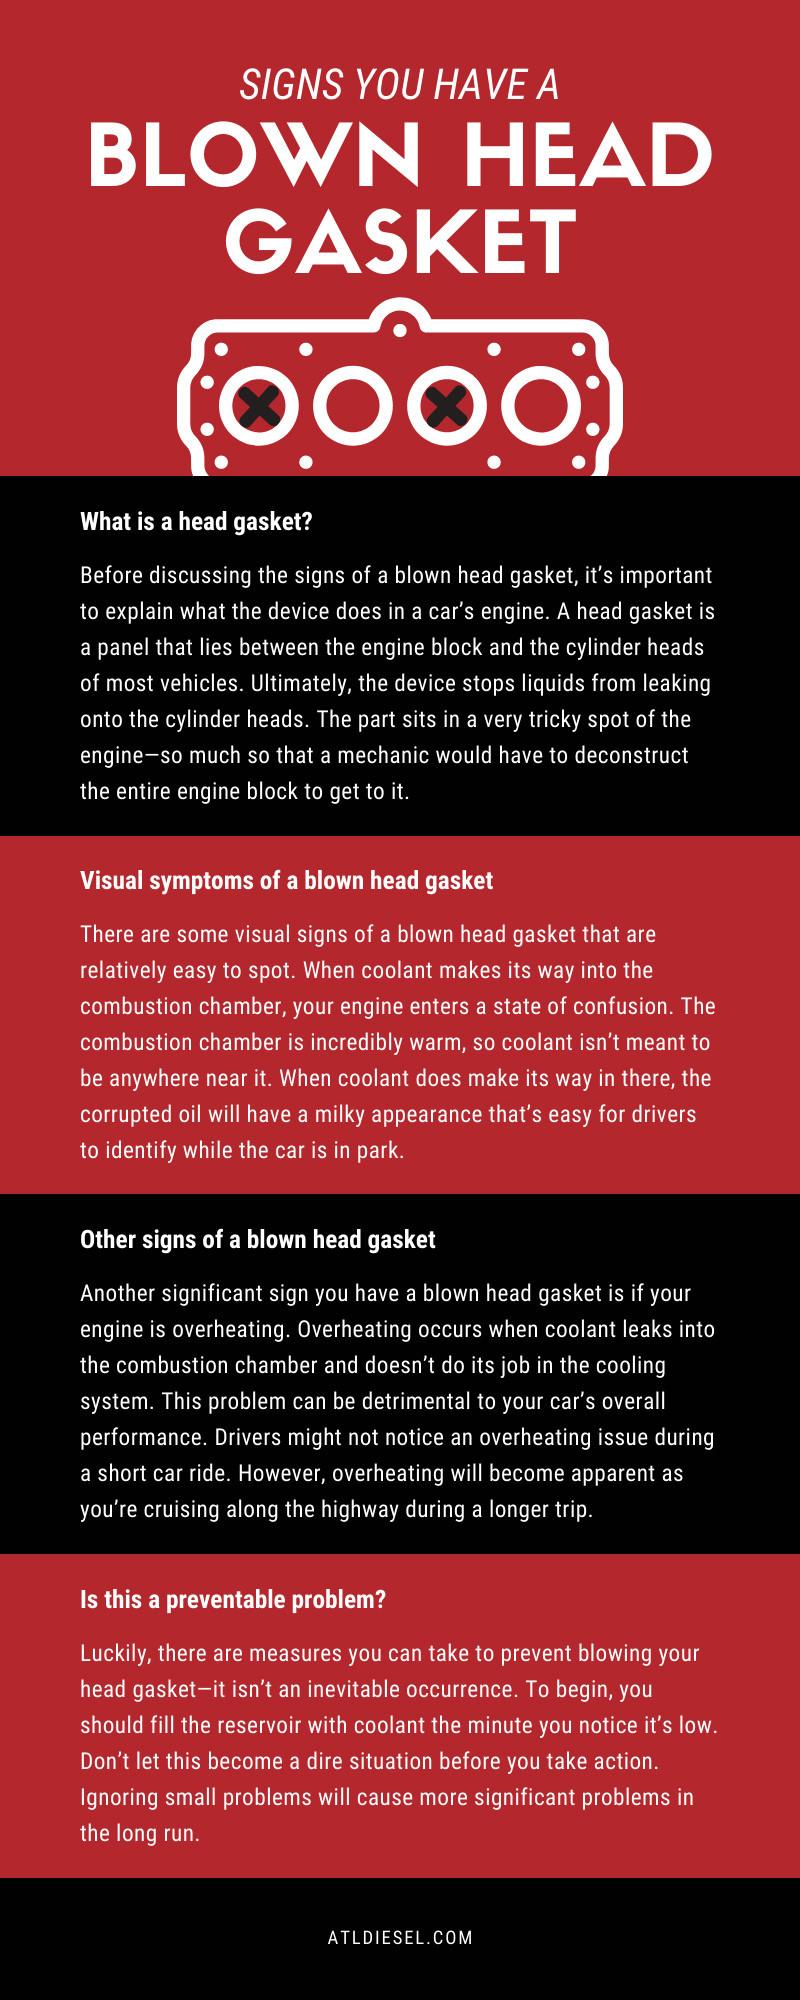 Blown Head Gasket Infographic